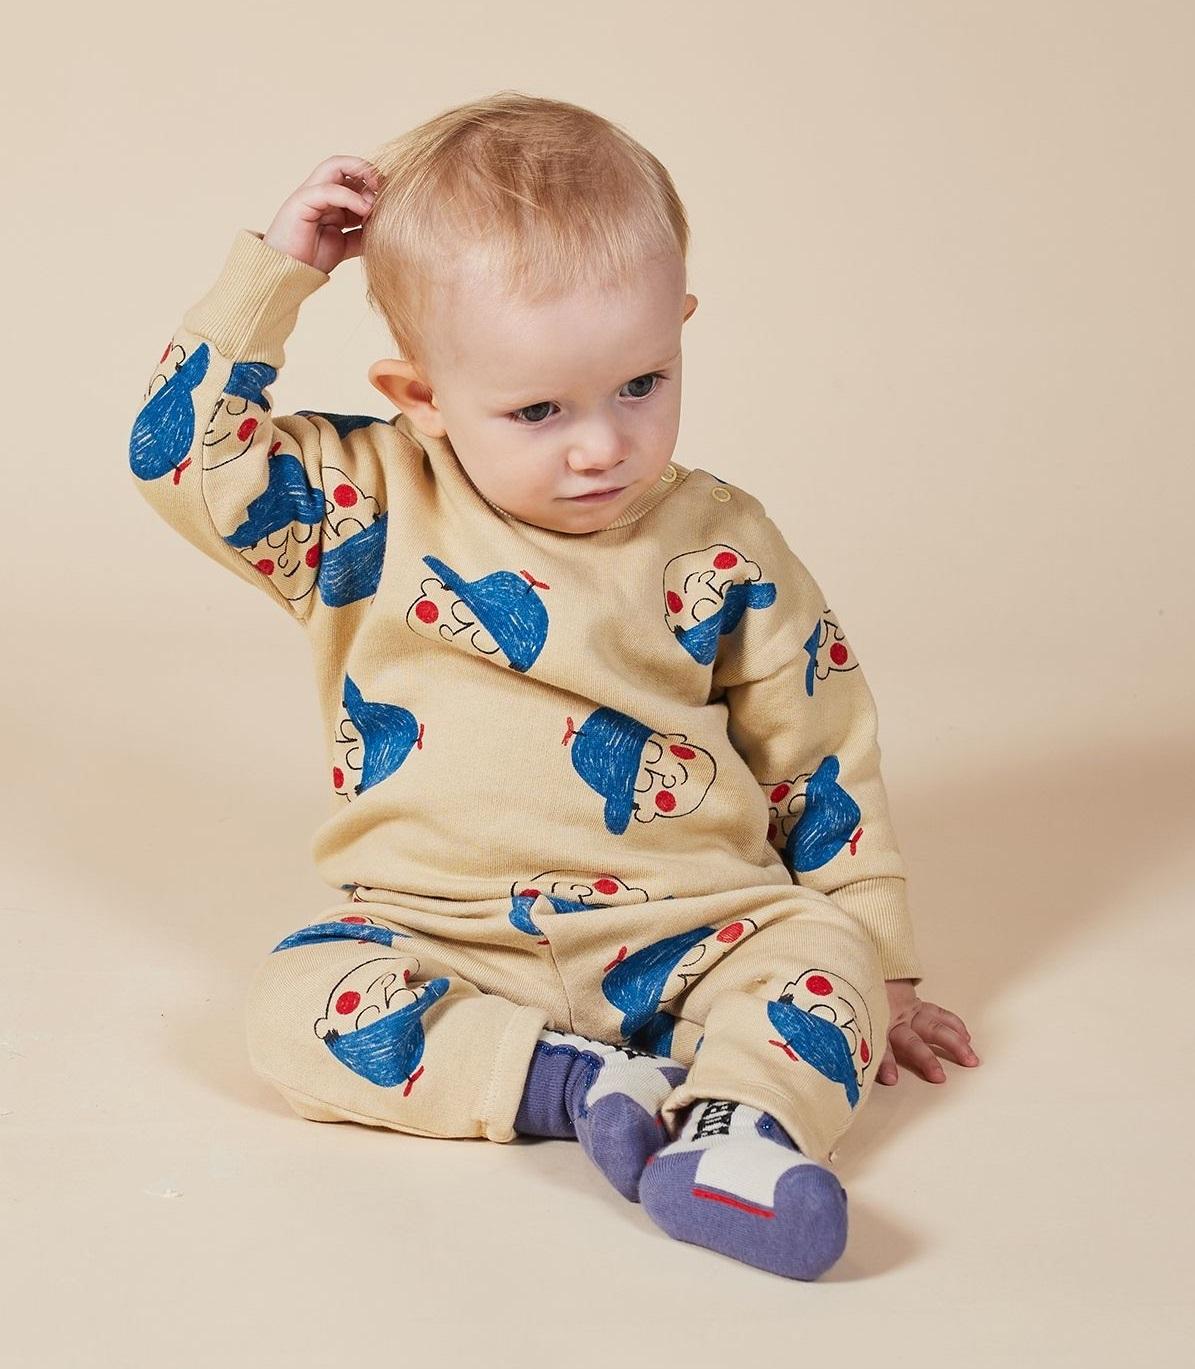 BOBO CHOSES ボボショセス Boy All Over Sweatshirt size:12-18M(80-90)~18-24M(90-100)